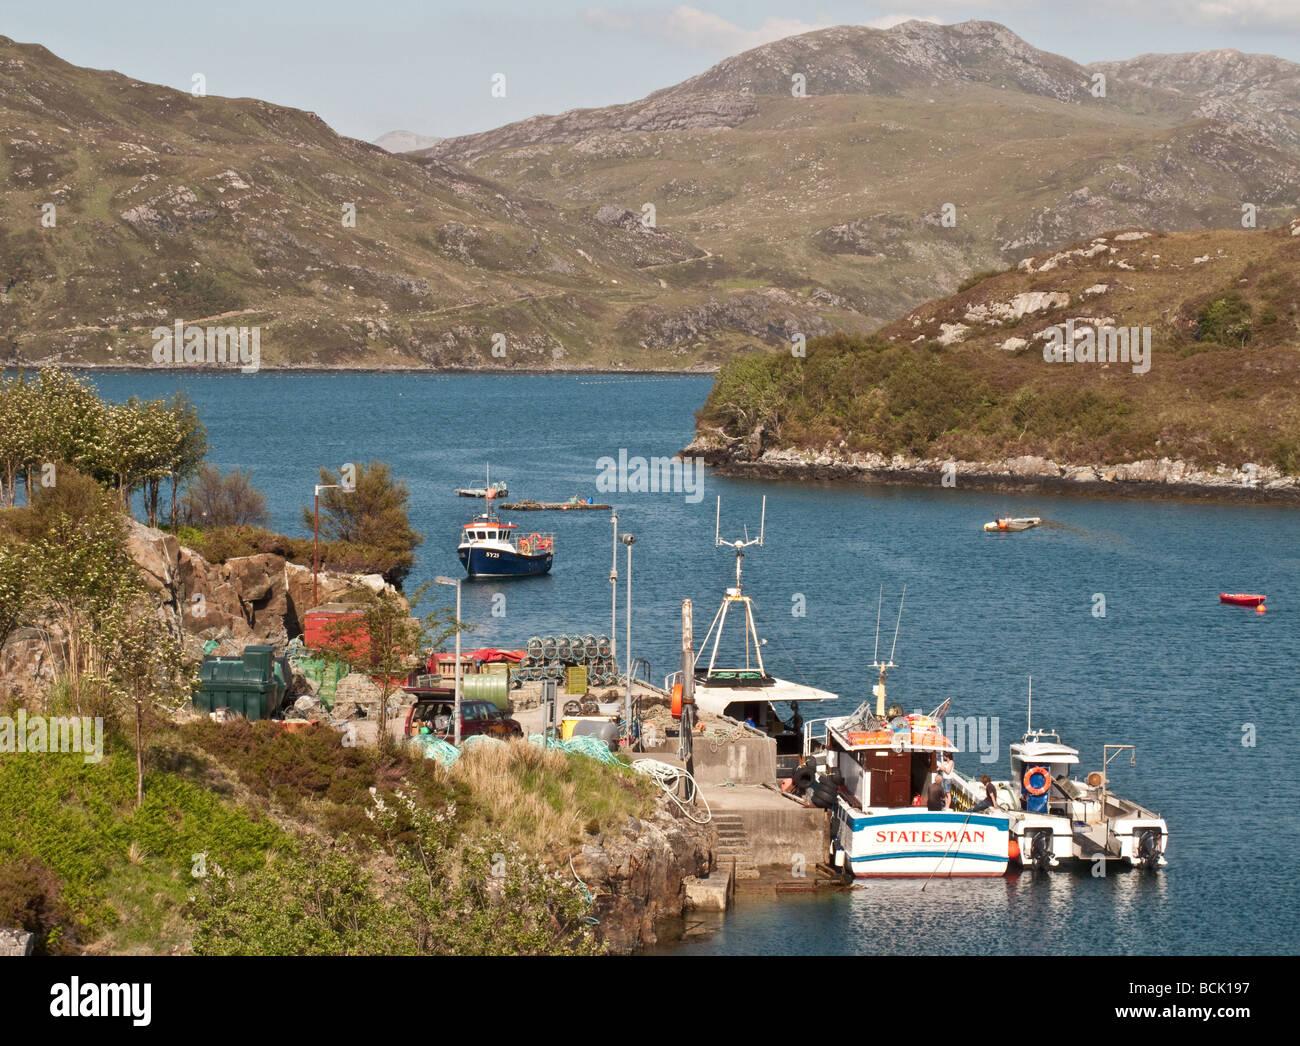 Kylesku Harbour West Highlands Scotland UK - Stock Image